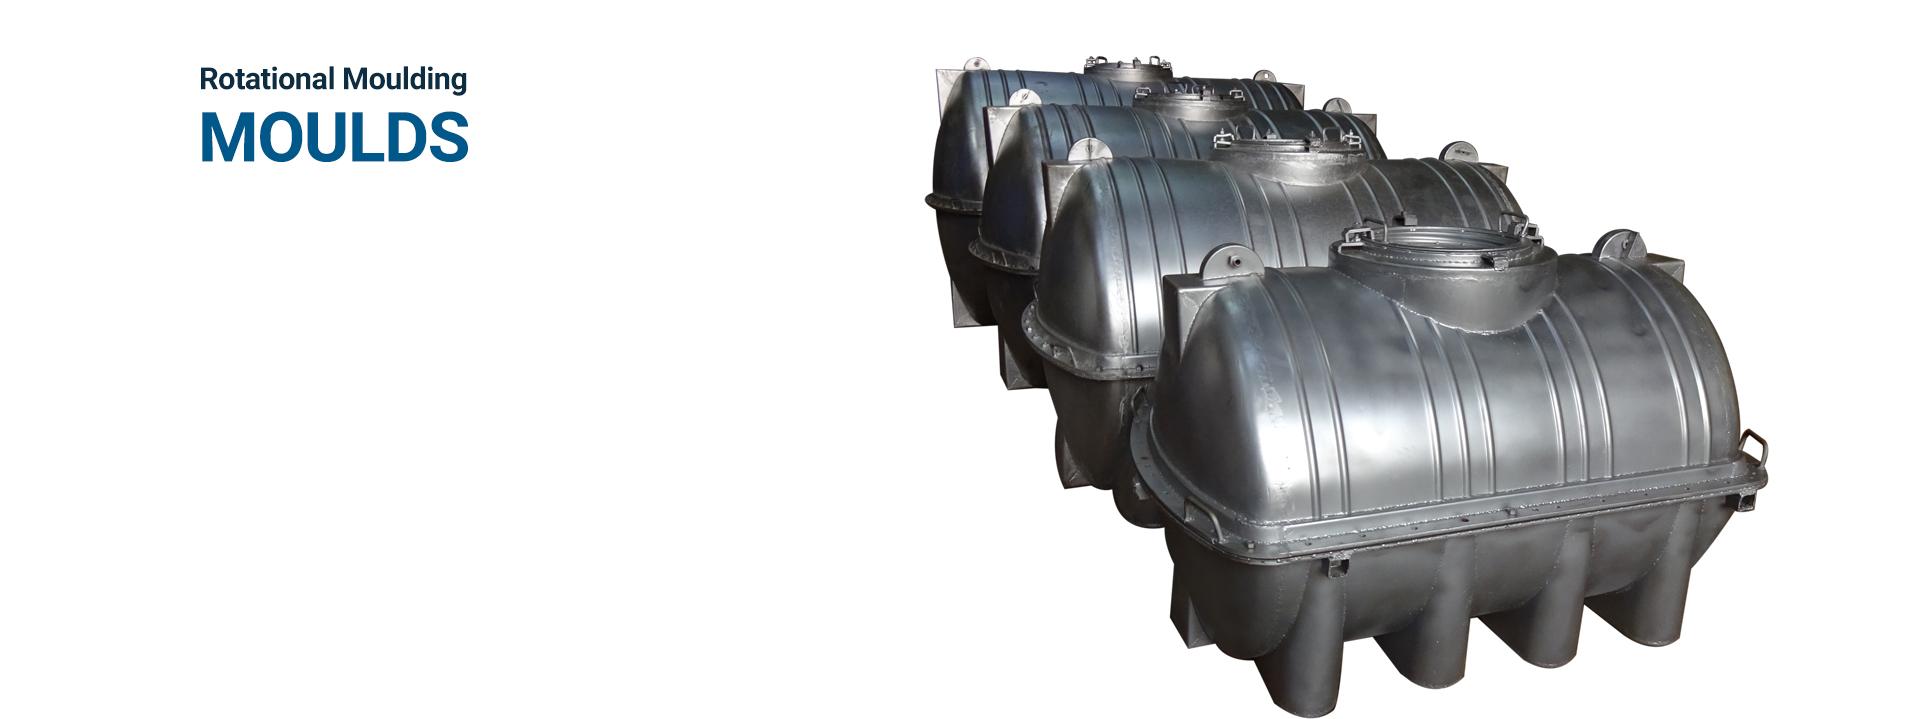 moulds - Road Barrier Mould Manufacturer in Indiamoulds